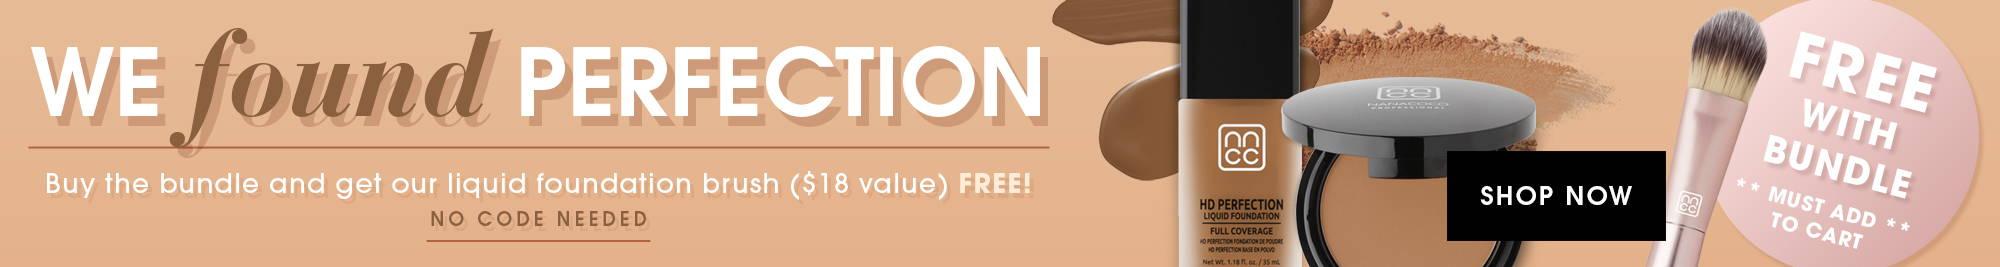 Nanacoco Professional HD Perfection Powder and Liquid foundation bundle with free liquid foundation brush